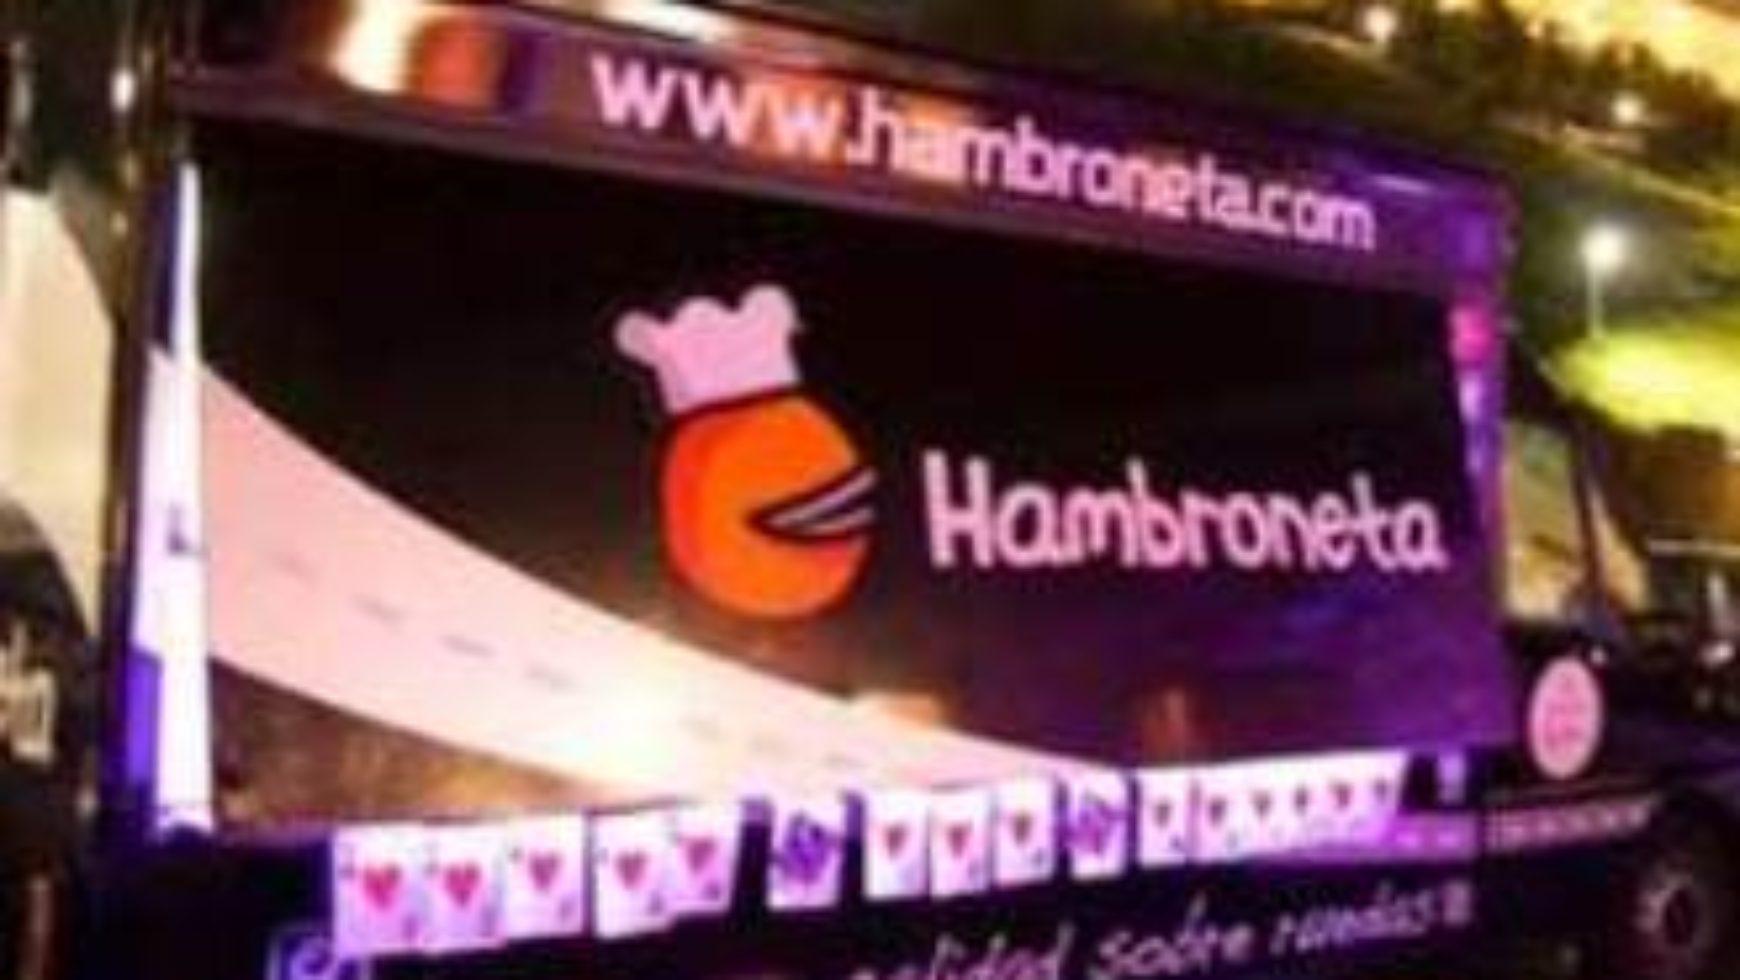 Hambroneta con Q de calidad Turistica